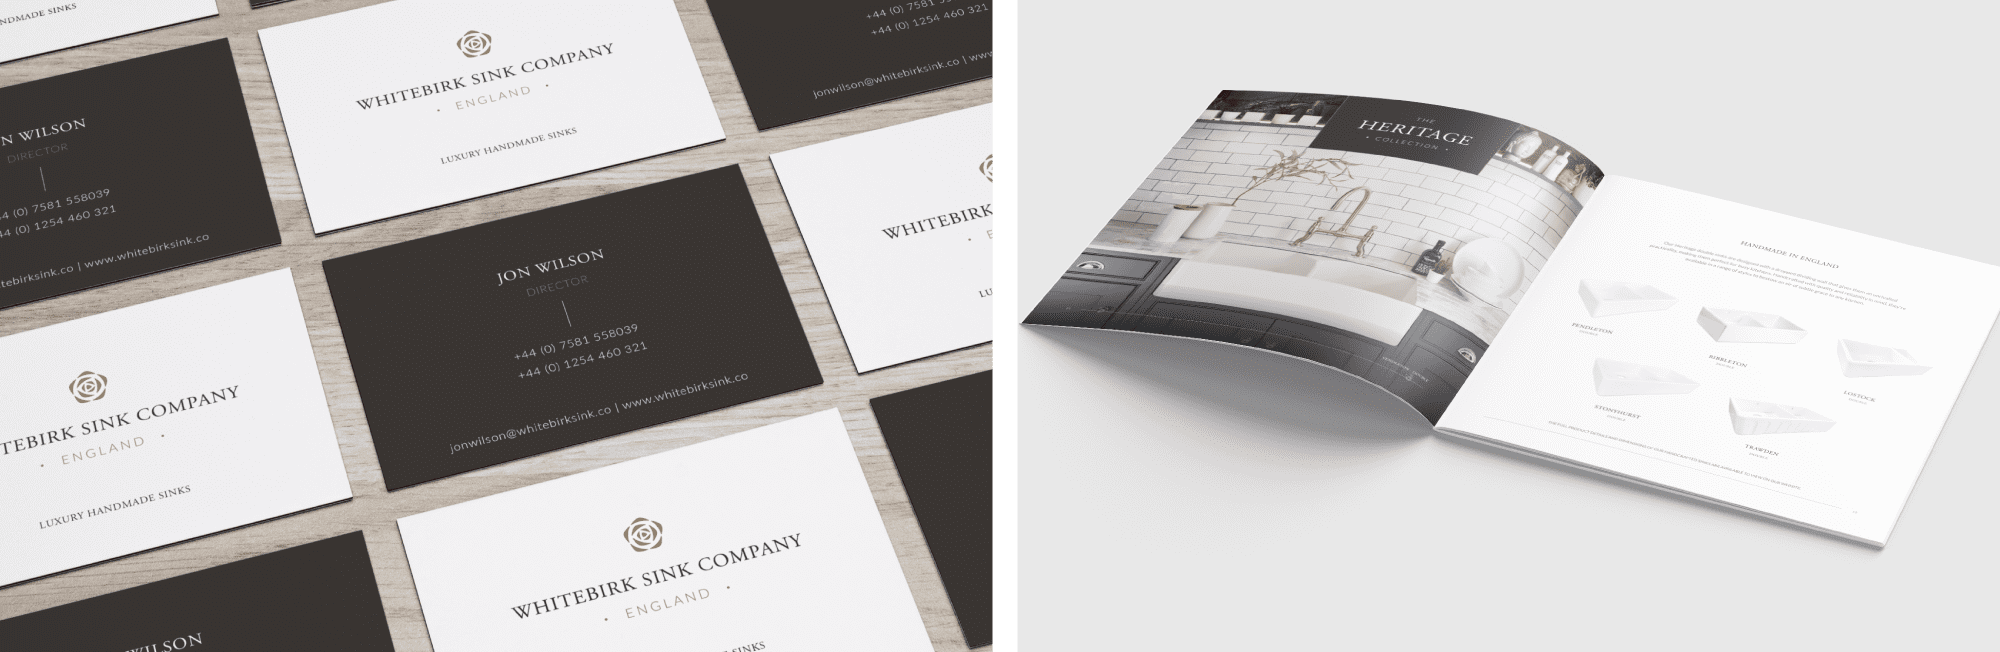 Whitebirk Sink Company - Graphic Design